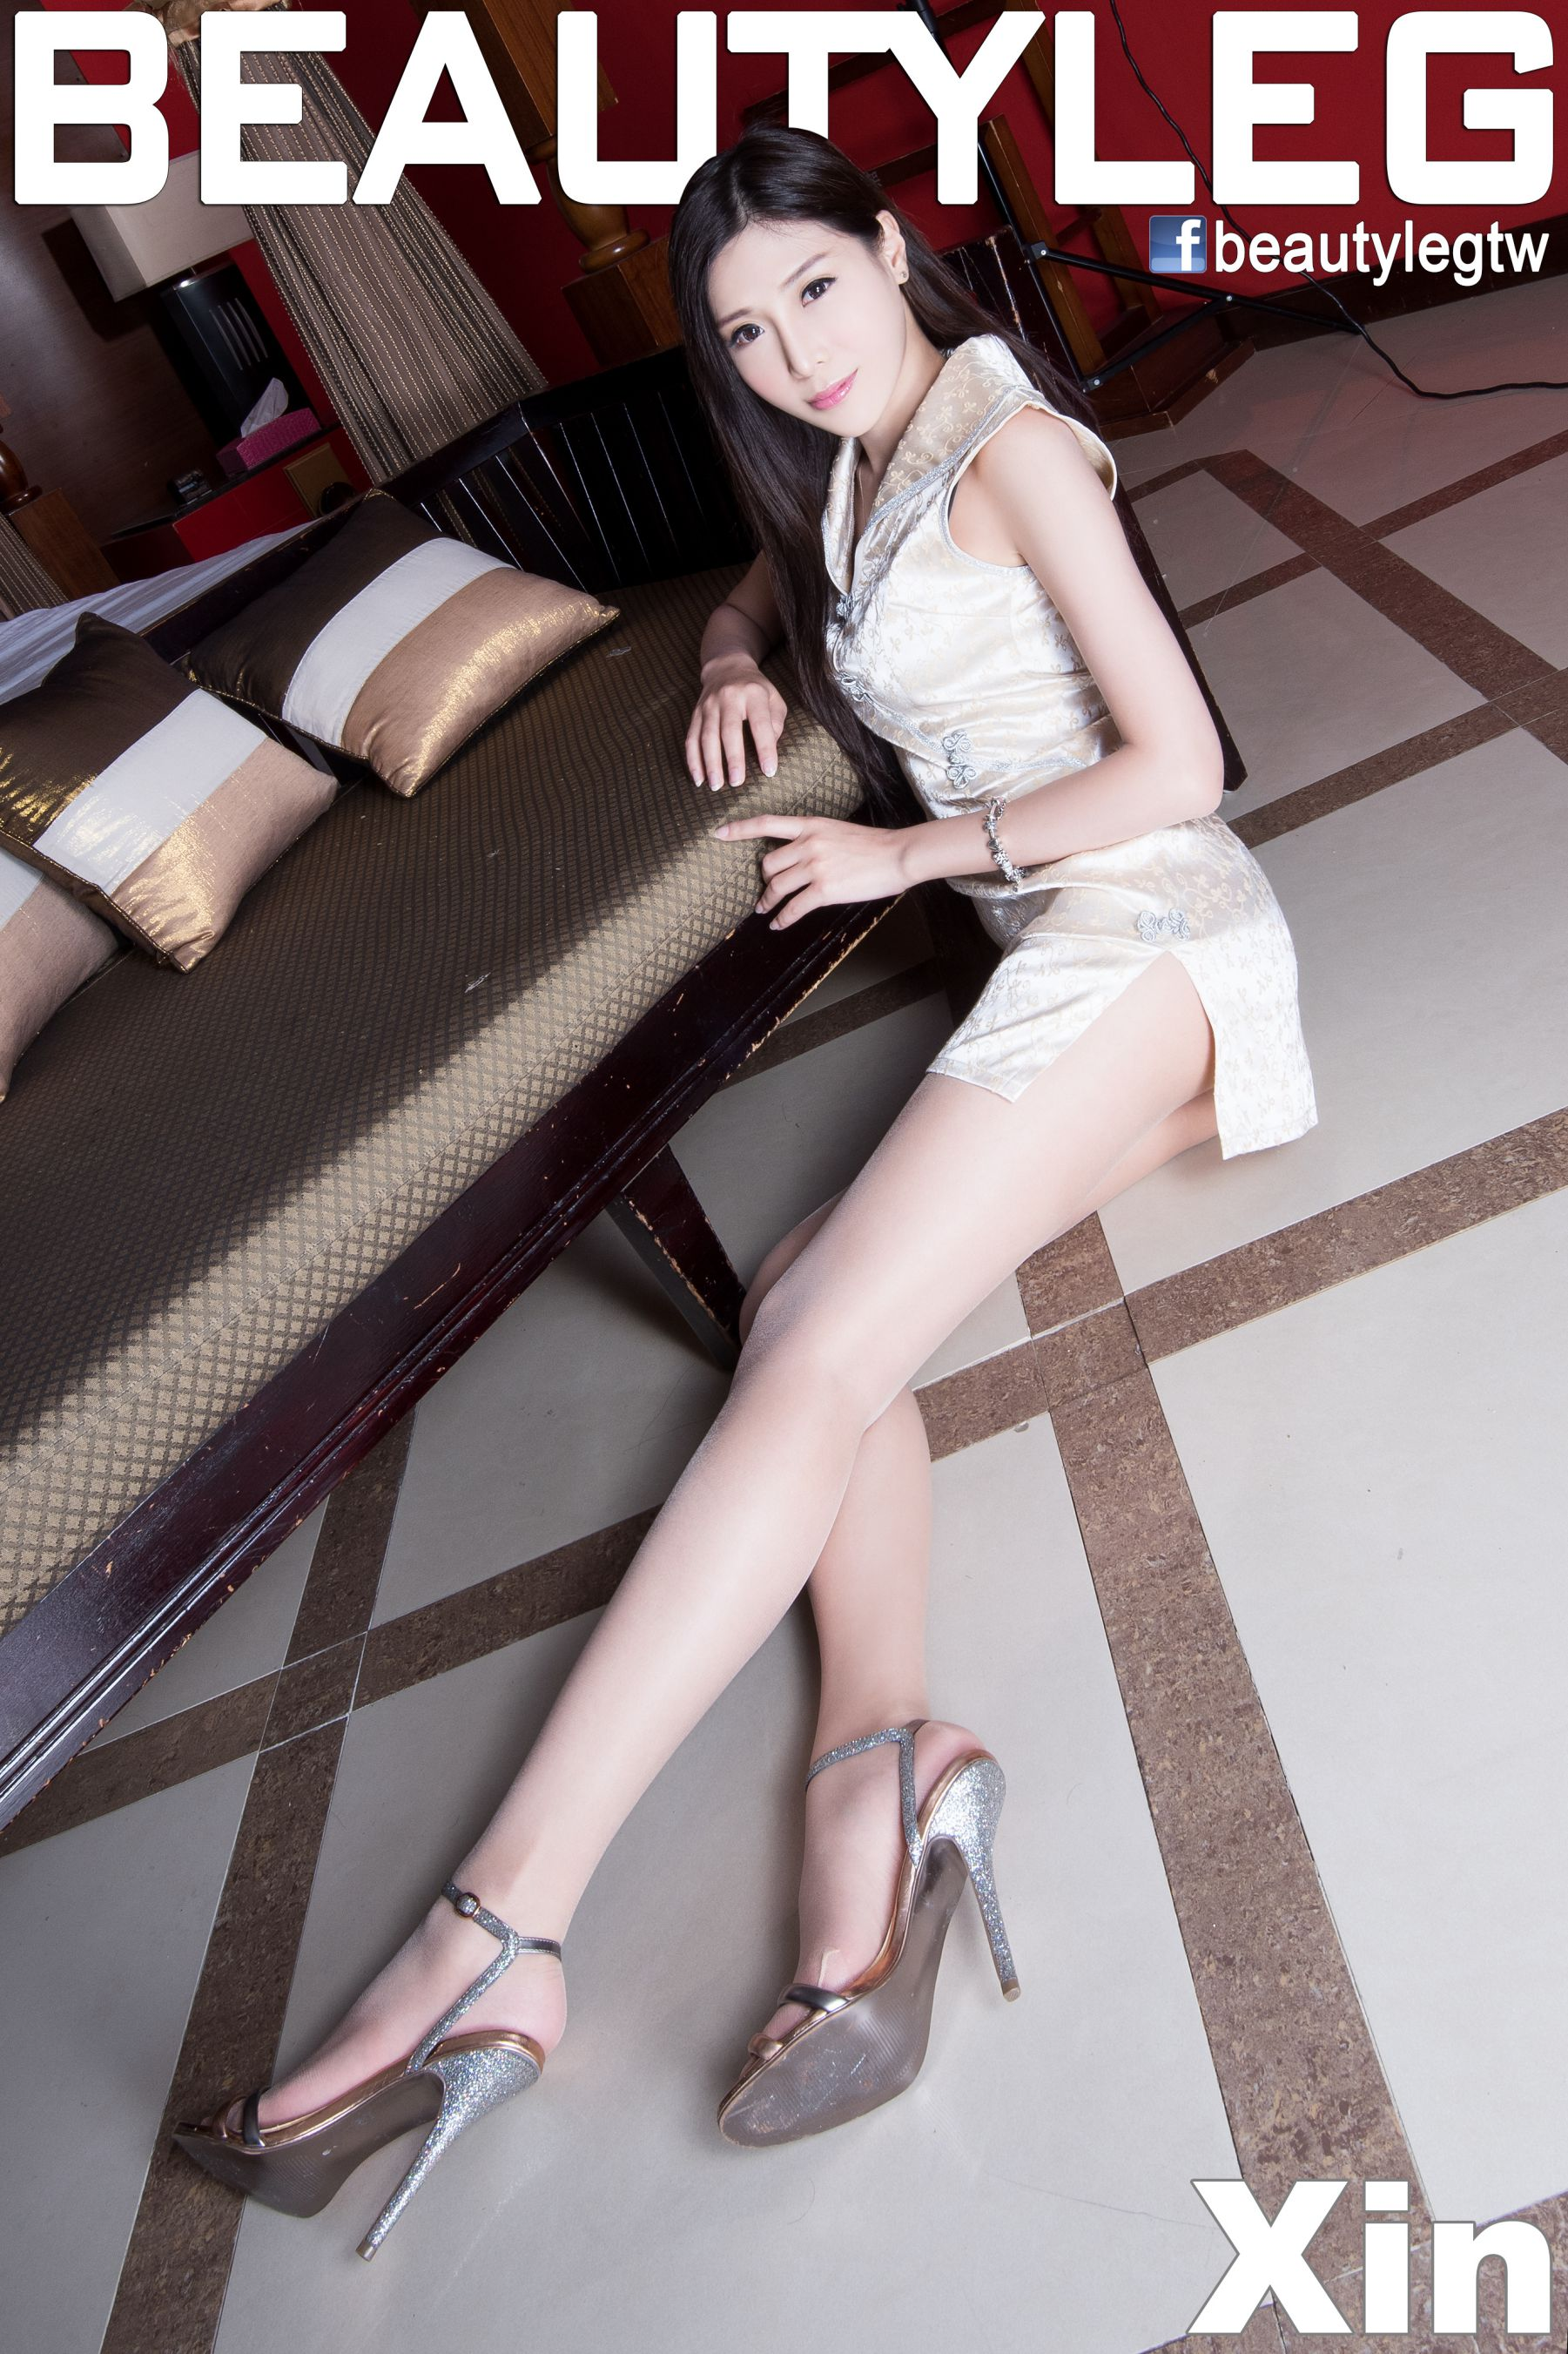 VOL.658 [Beautyleg]美腿旗袍:李小星(Beautyleg腿模Xin)高品质写真套图(66P)